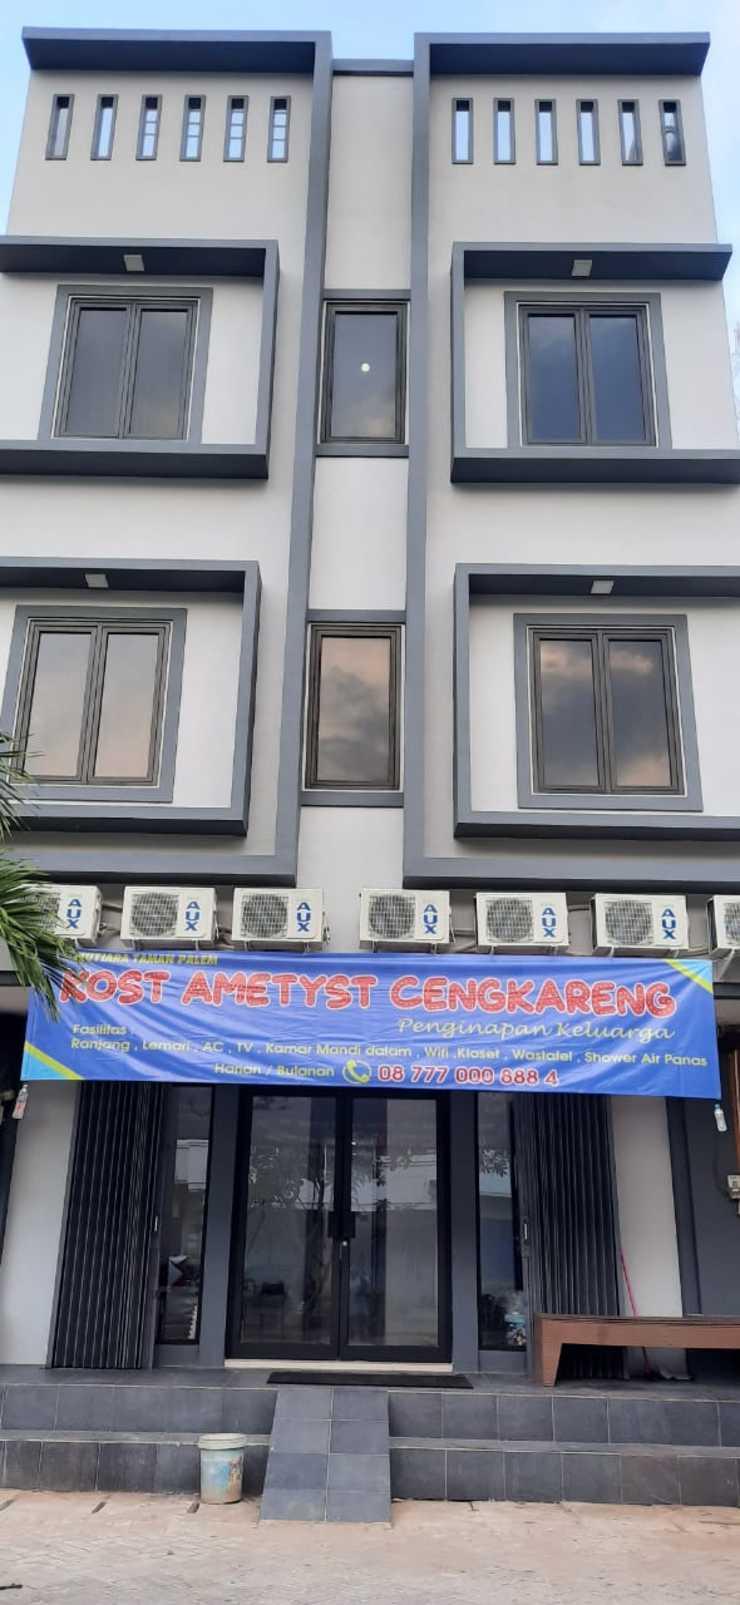 Amethyst Cengkareng Syariah Jakarta - Exterior